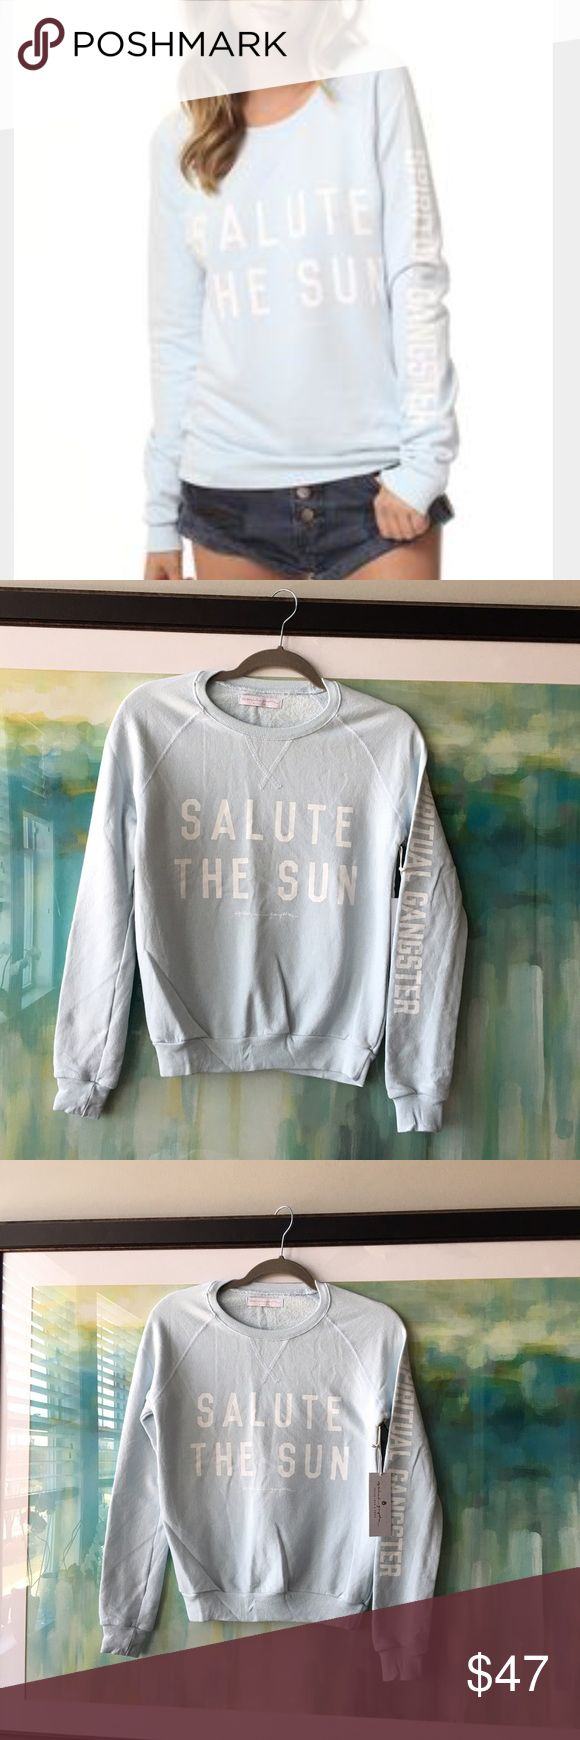 Spiritual Gangster Sweatshirt Spiritual Gangster Sweatshirt in Frost (light blue). Salute the Sun script! Very cute! 💖🎉🙌 Spiritaul Gangster Tops Sweatshirts & Hoodies